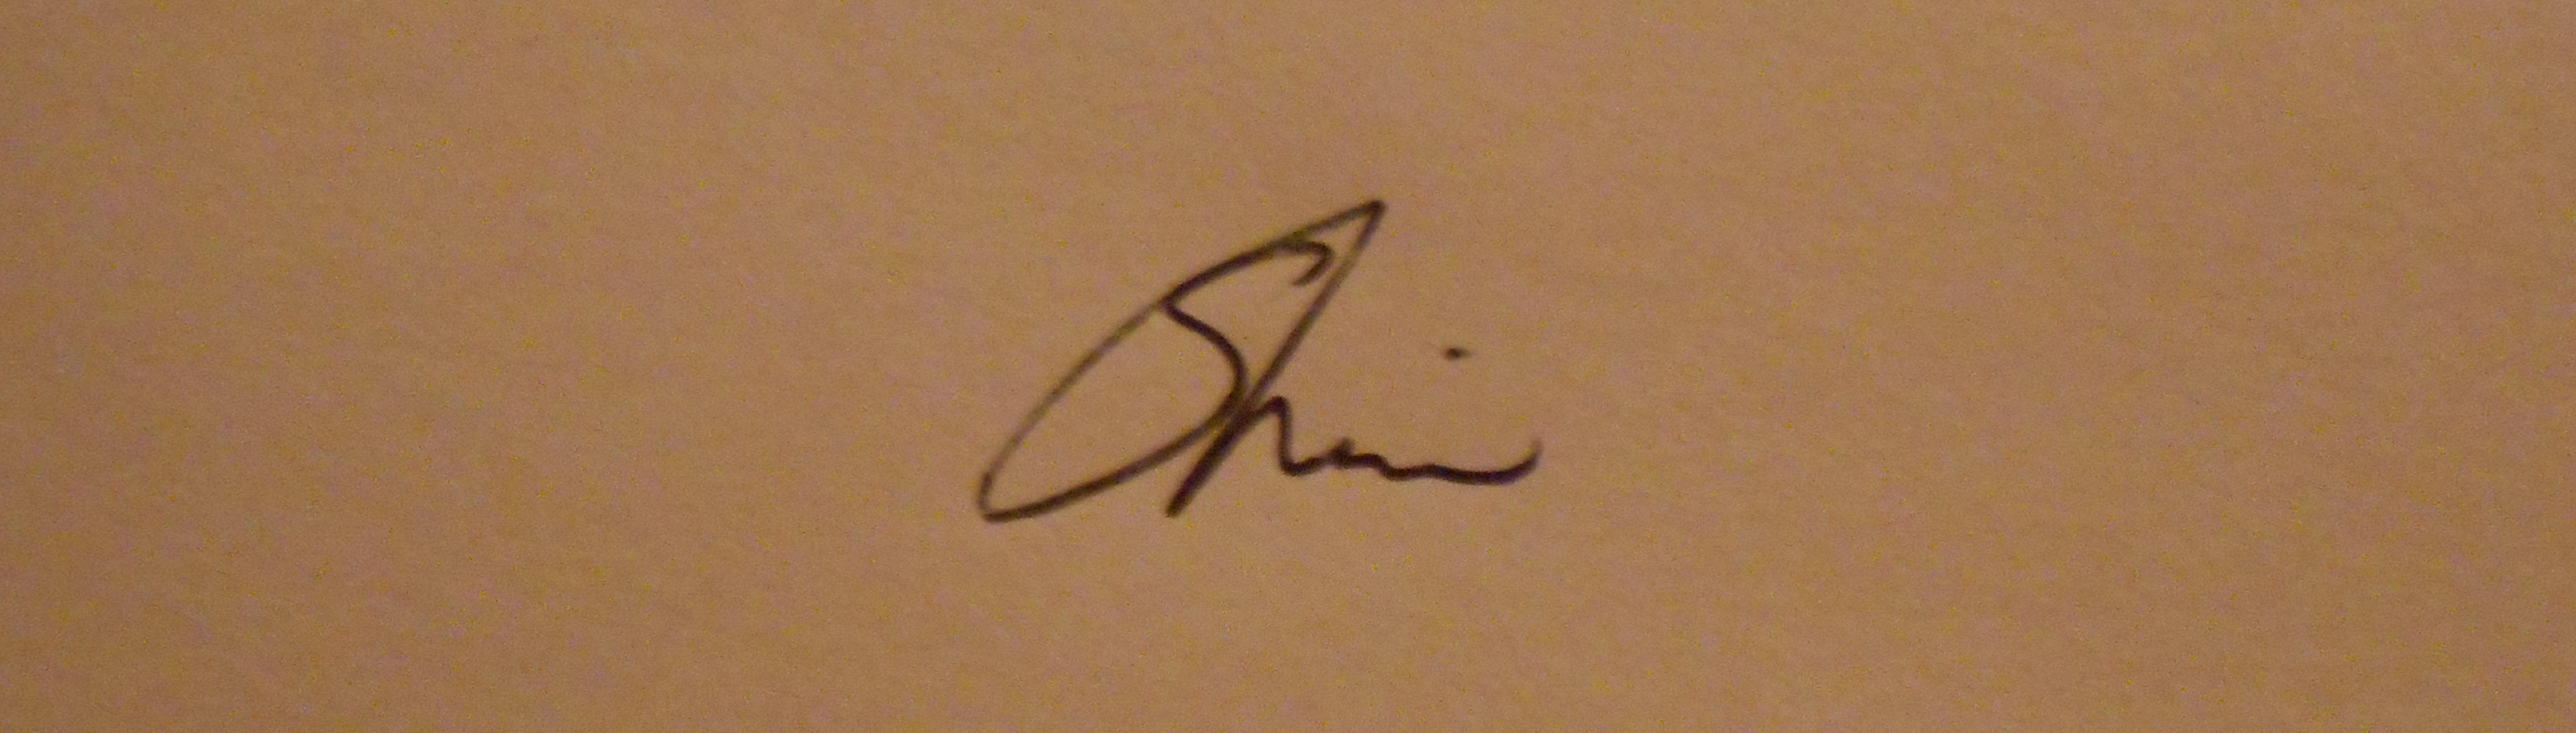 sherin Signature